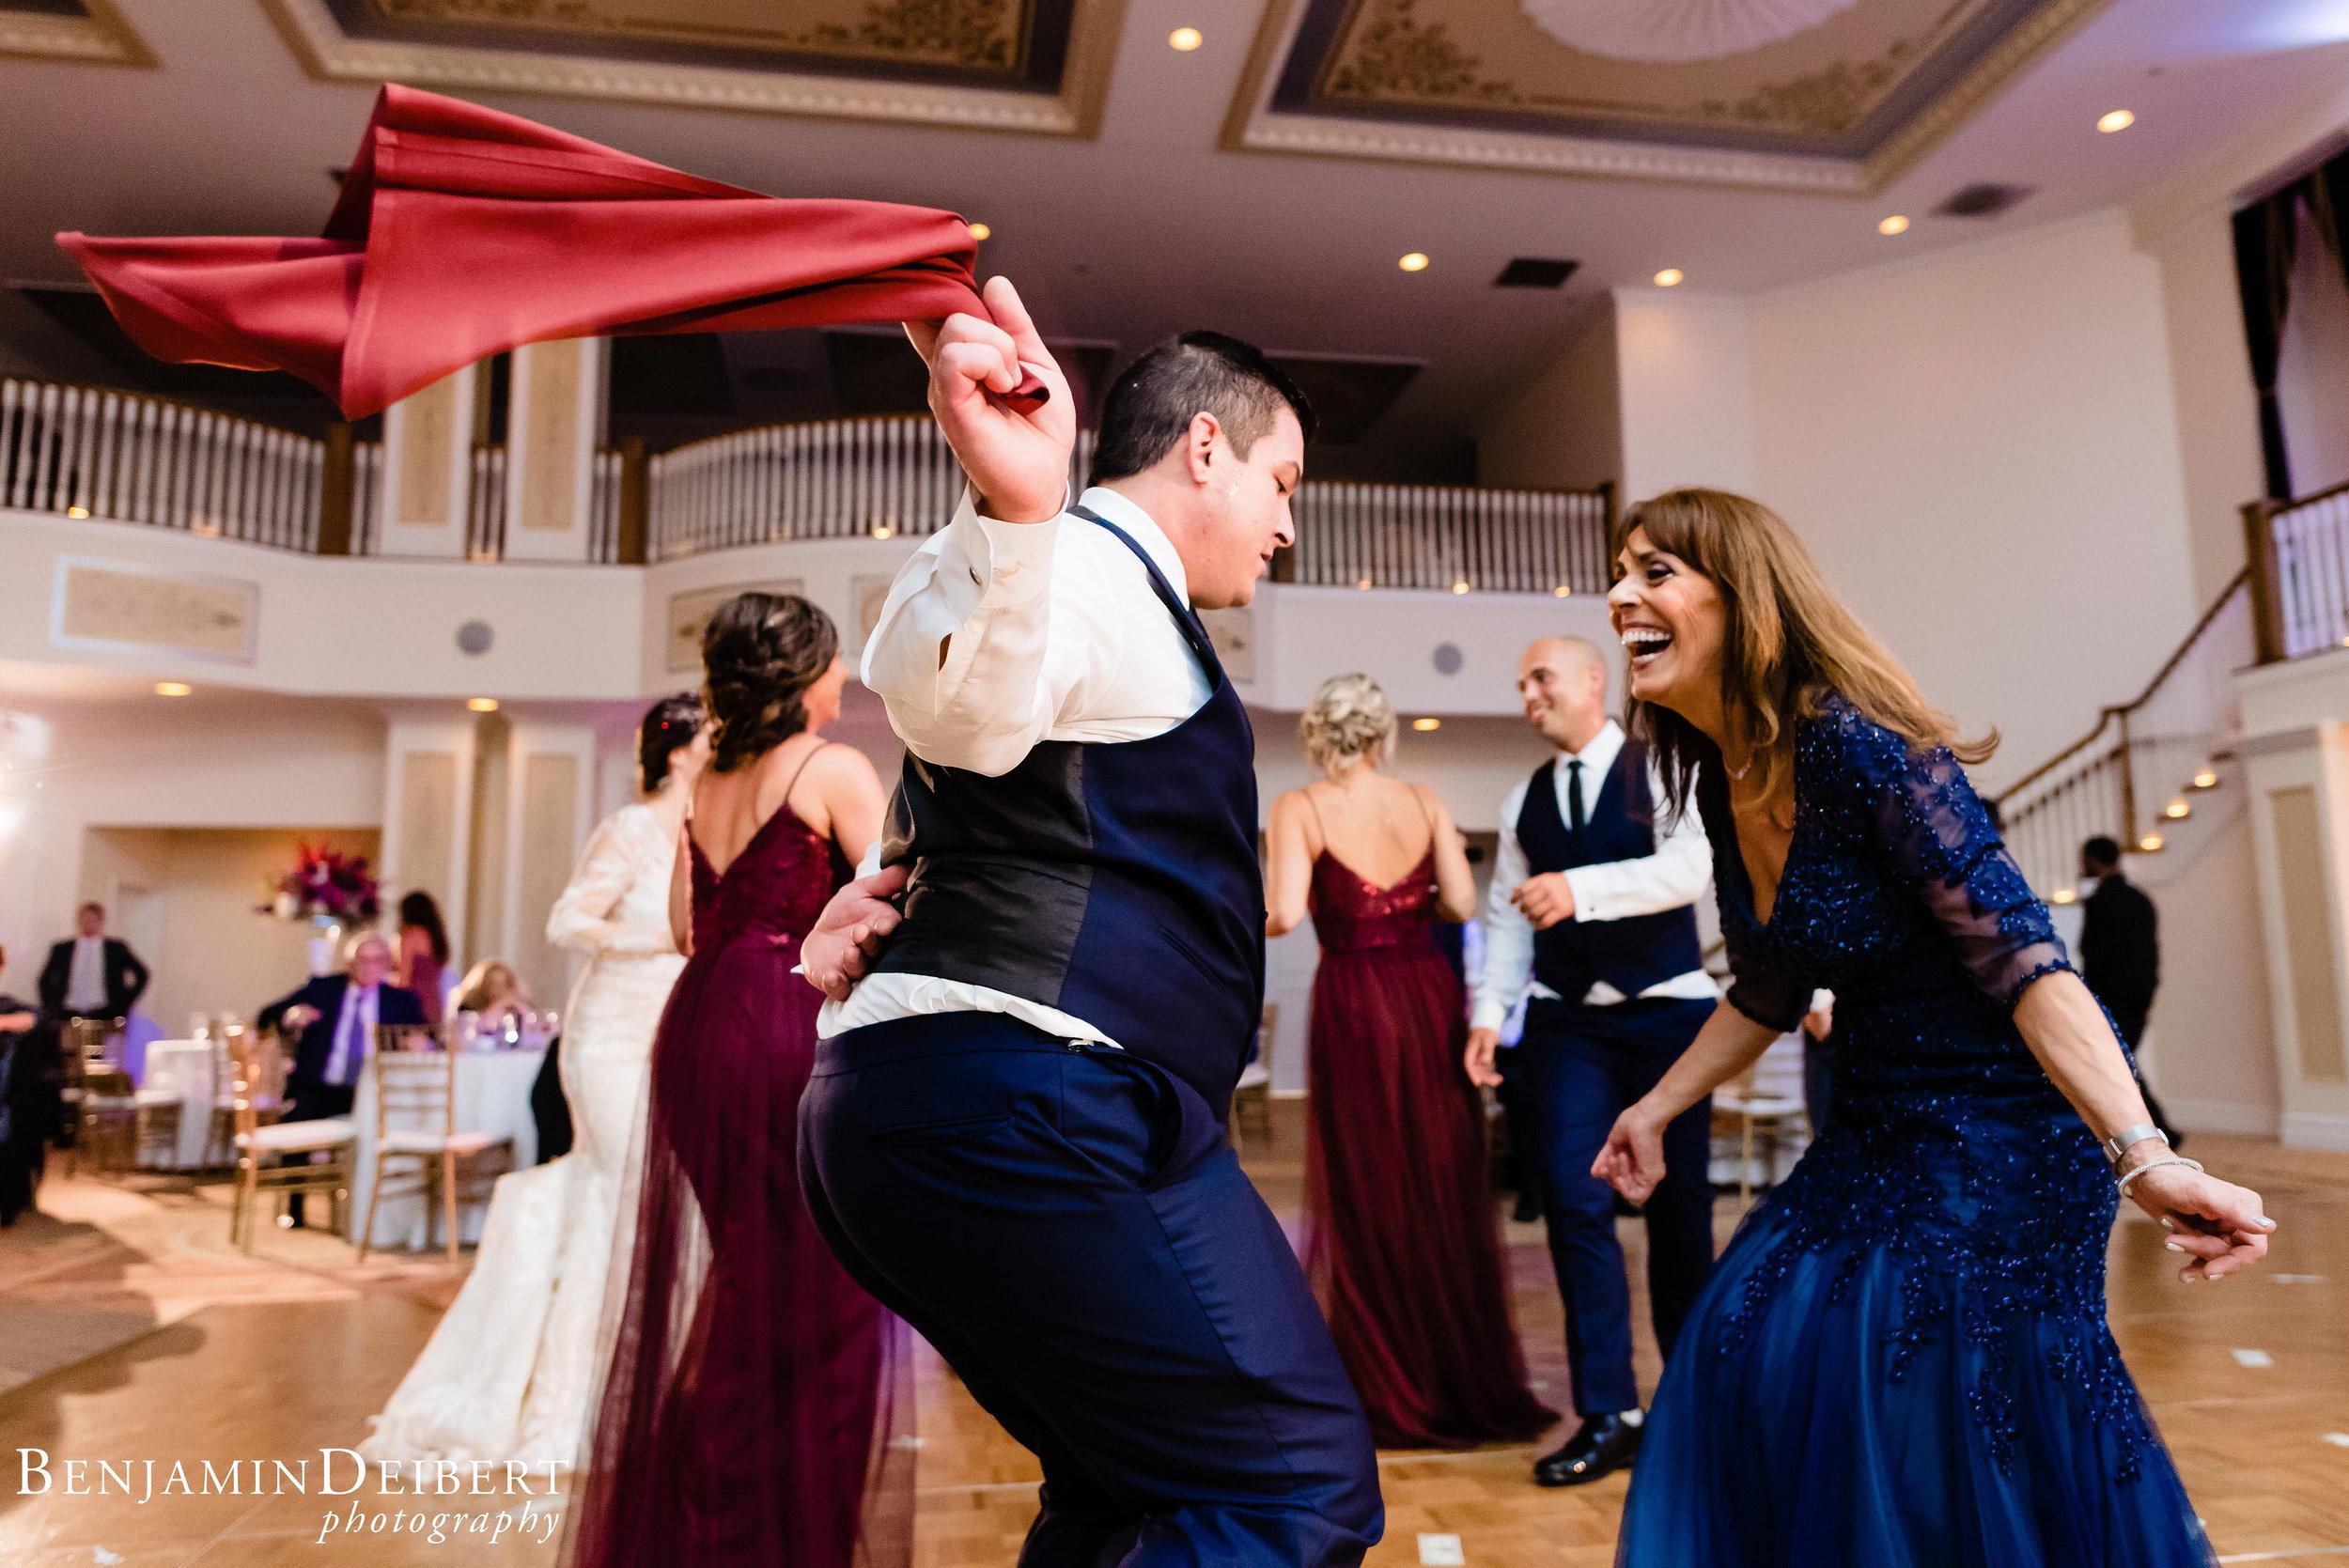 AmandaandElliott_TheCarriageHouse_Wedding-72.jpg